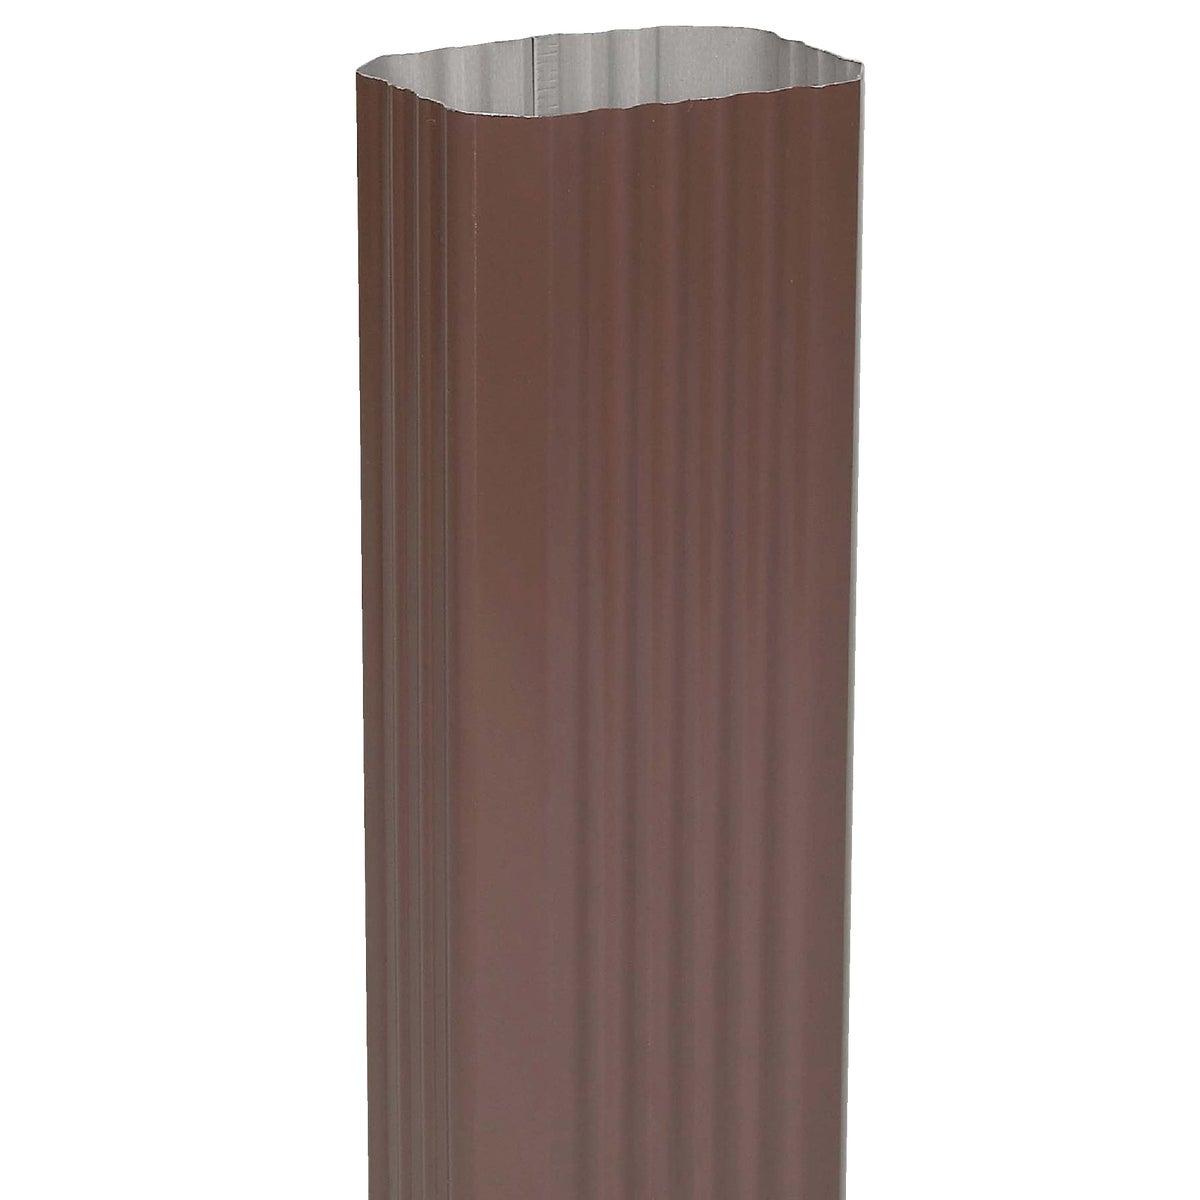 3X4 Brown Downspout